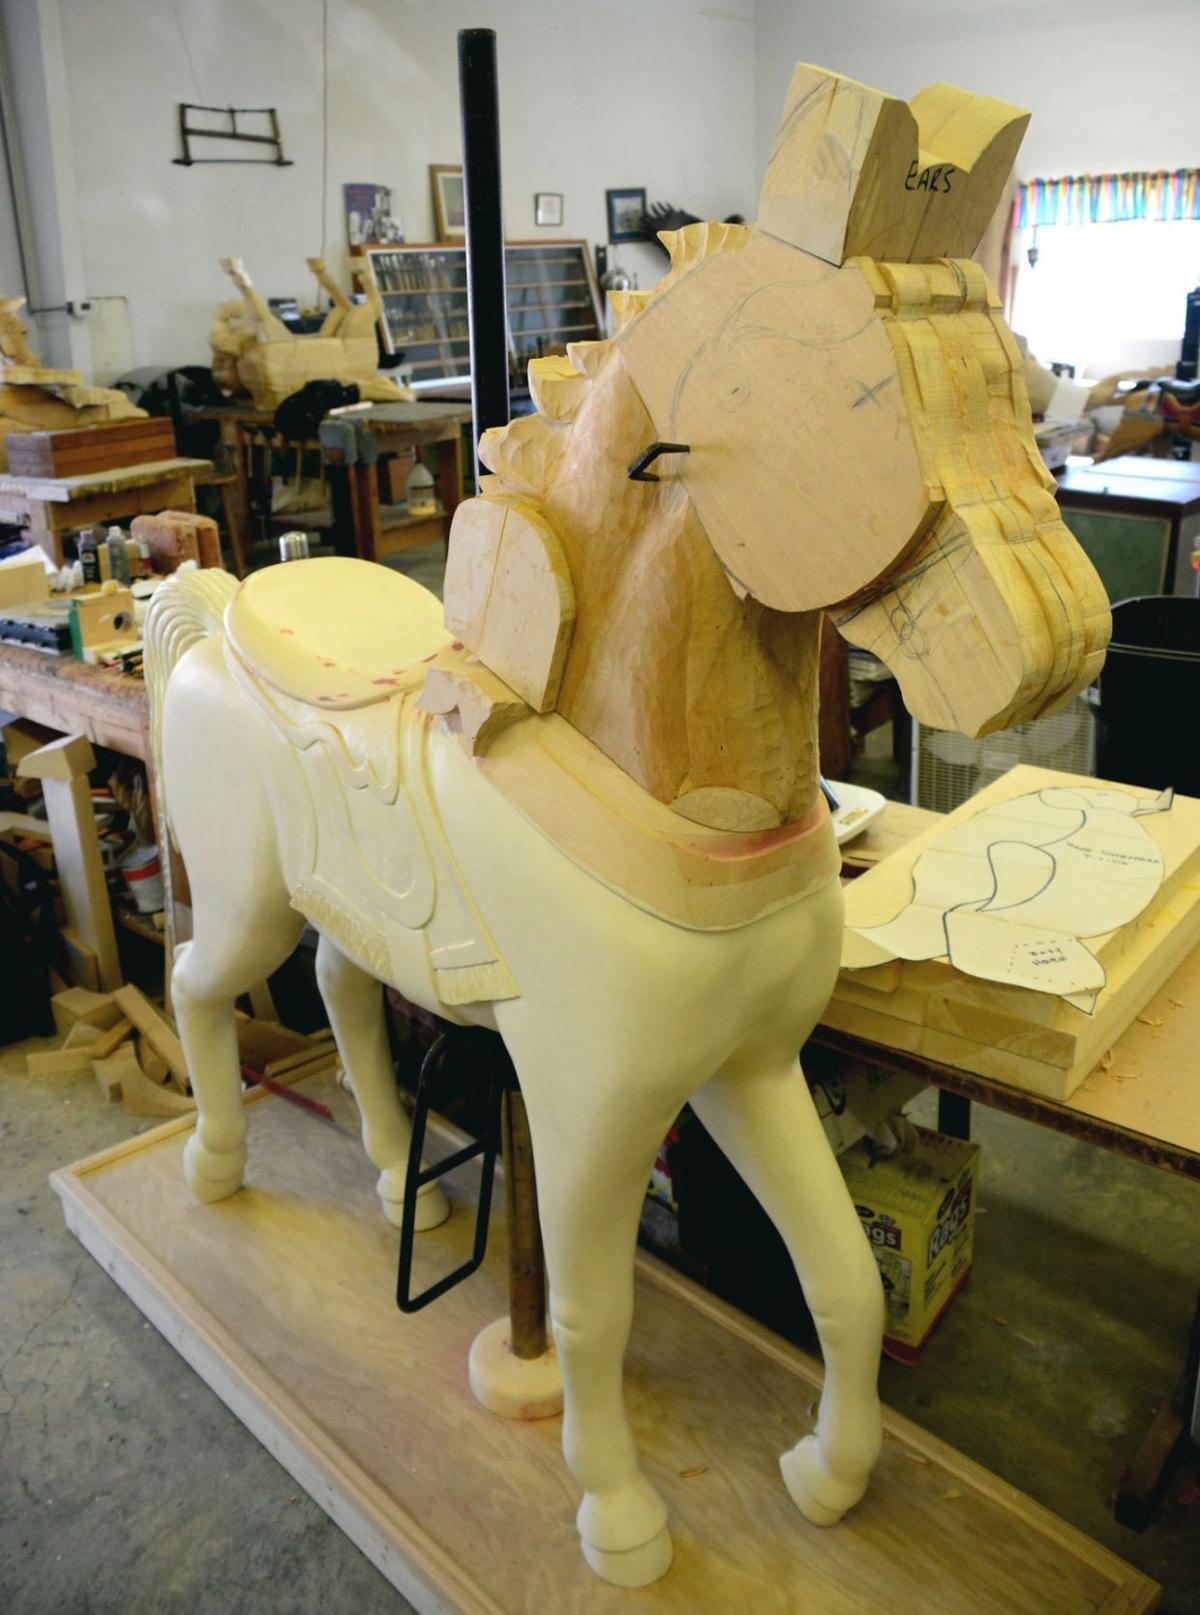 Horsin' Around Carousel Carving School in Soddy Daisy, Tenn